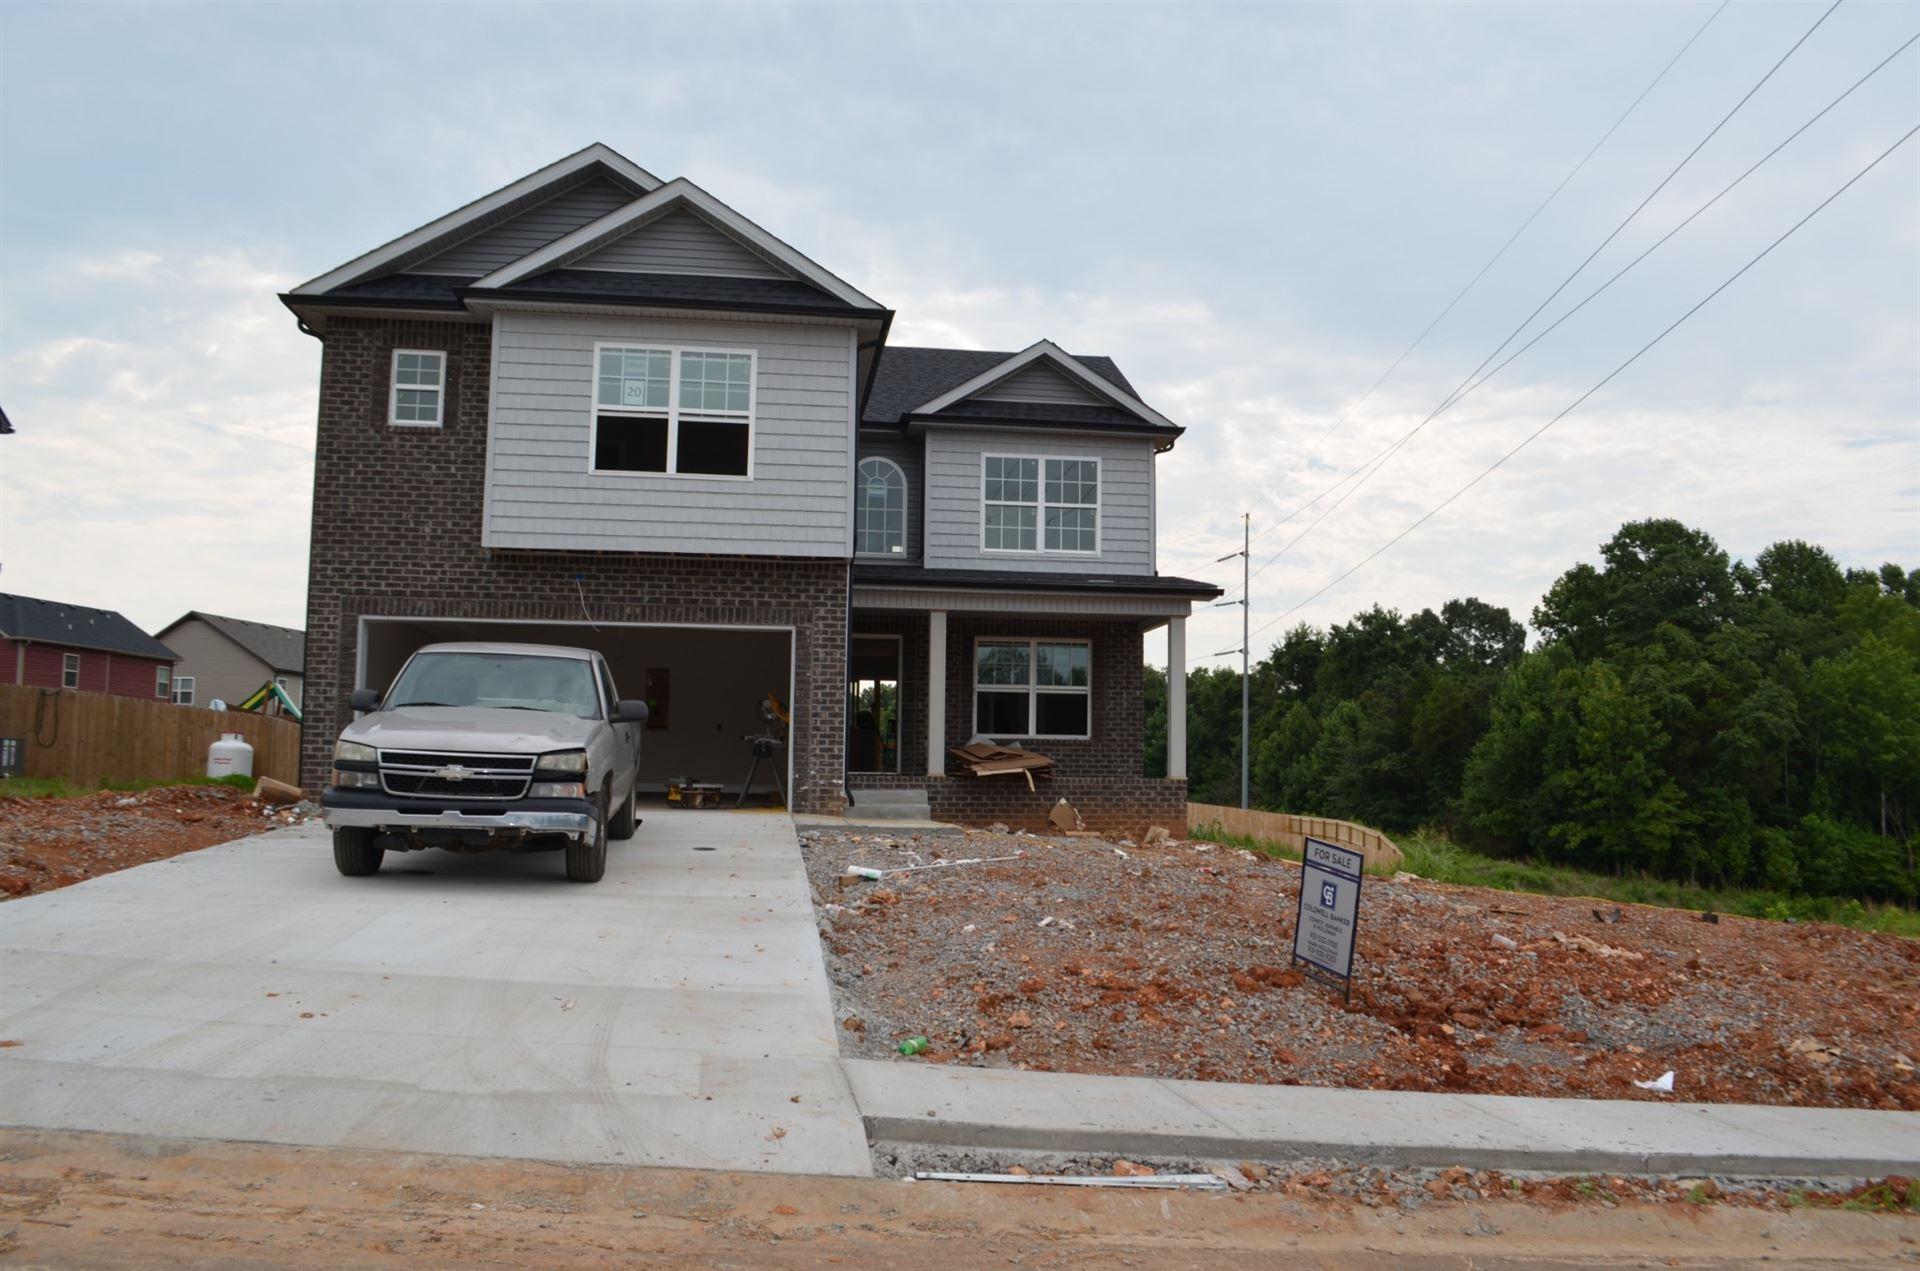 20 Woodland Springs, Clarksville, TN 37042 - MLS#: 2275860